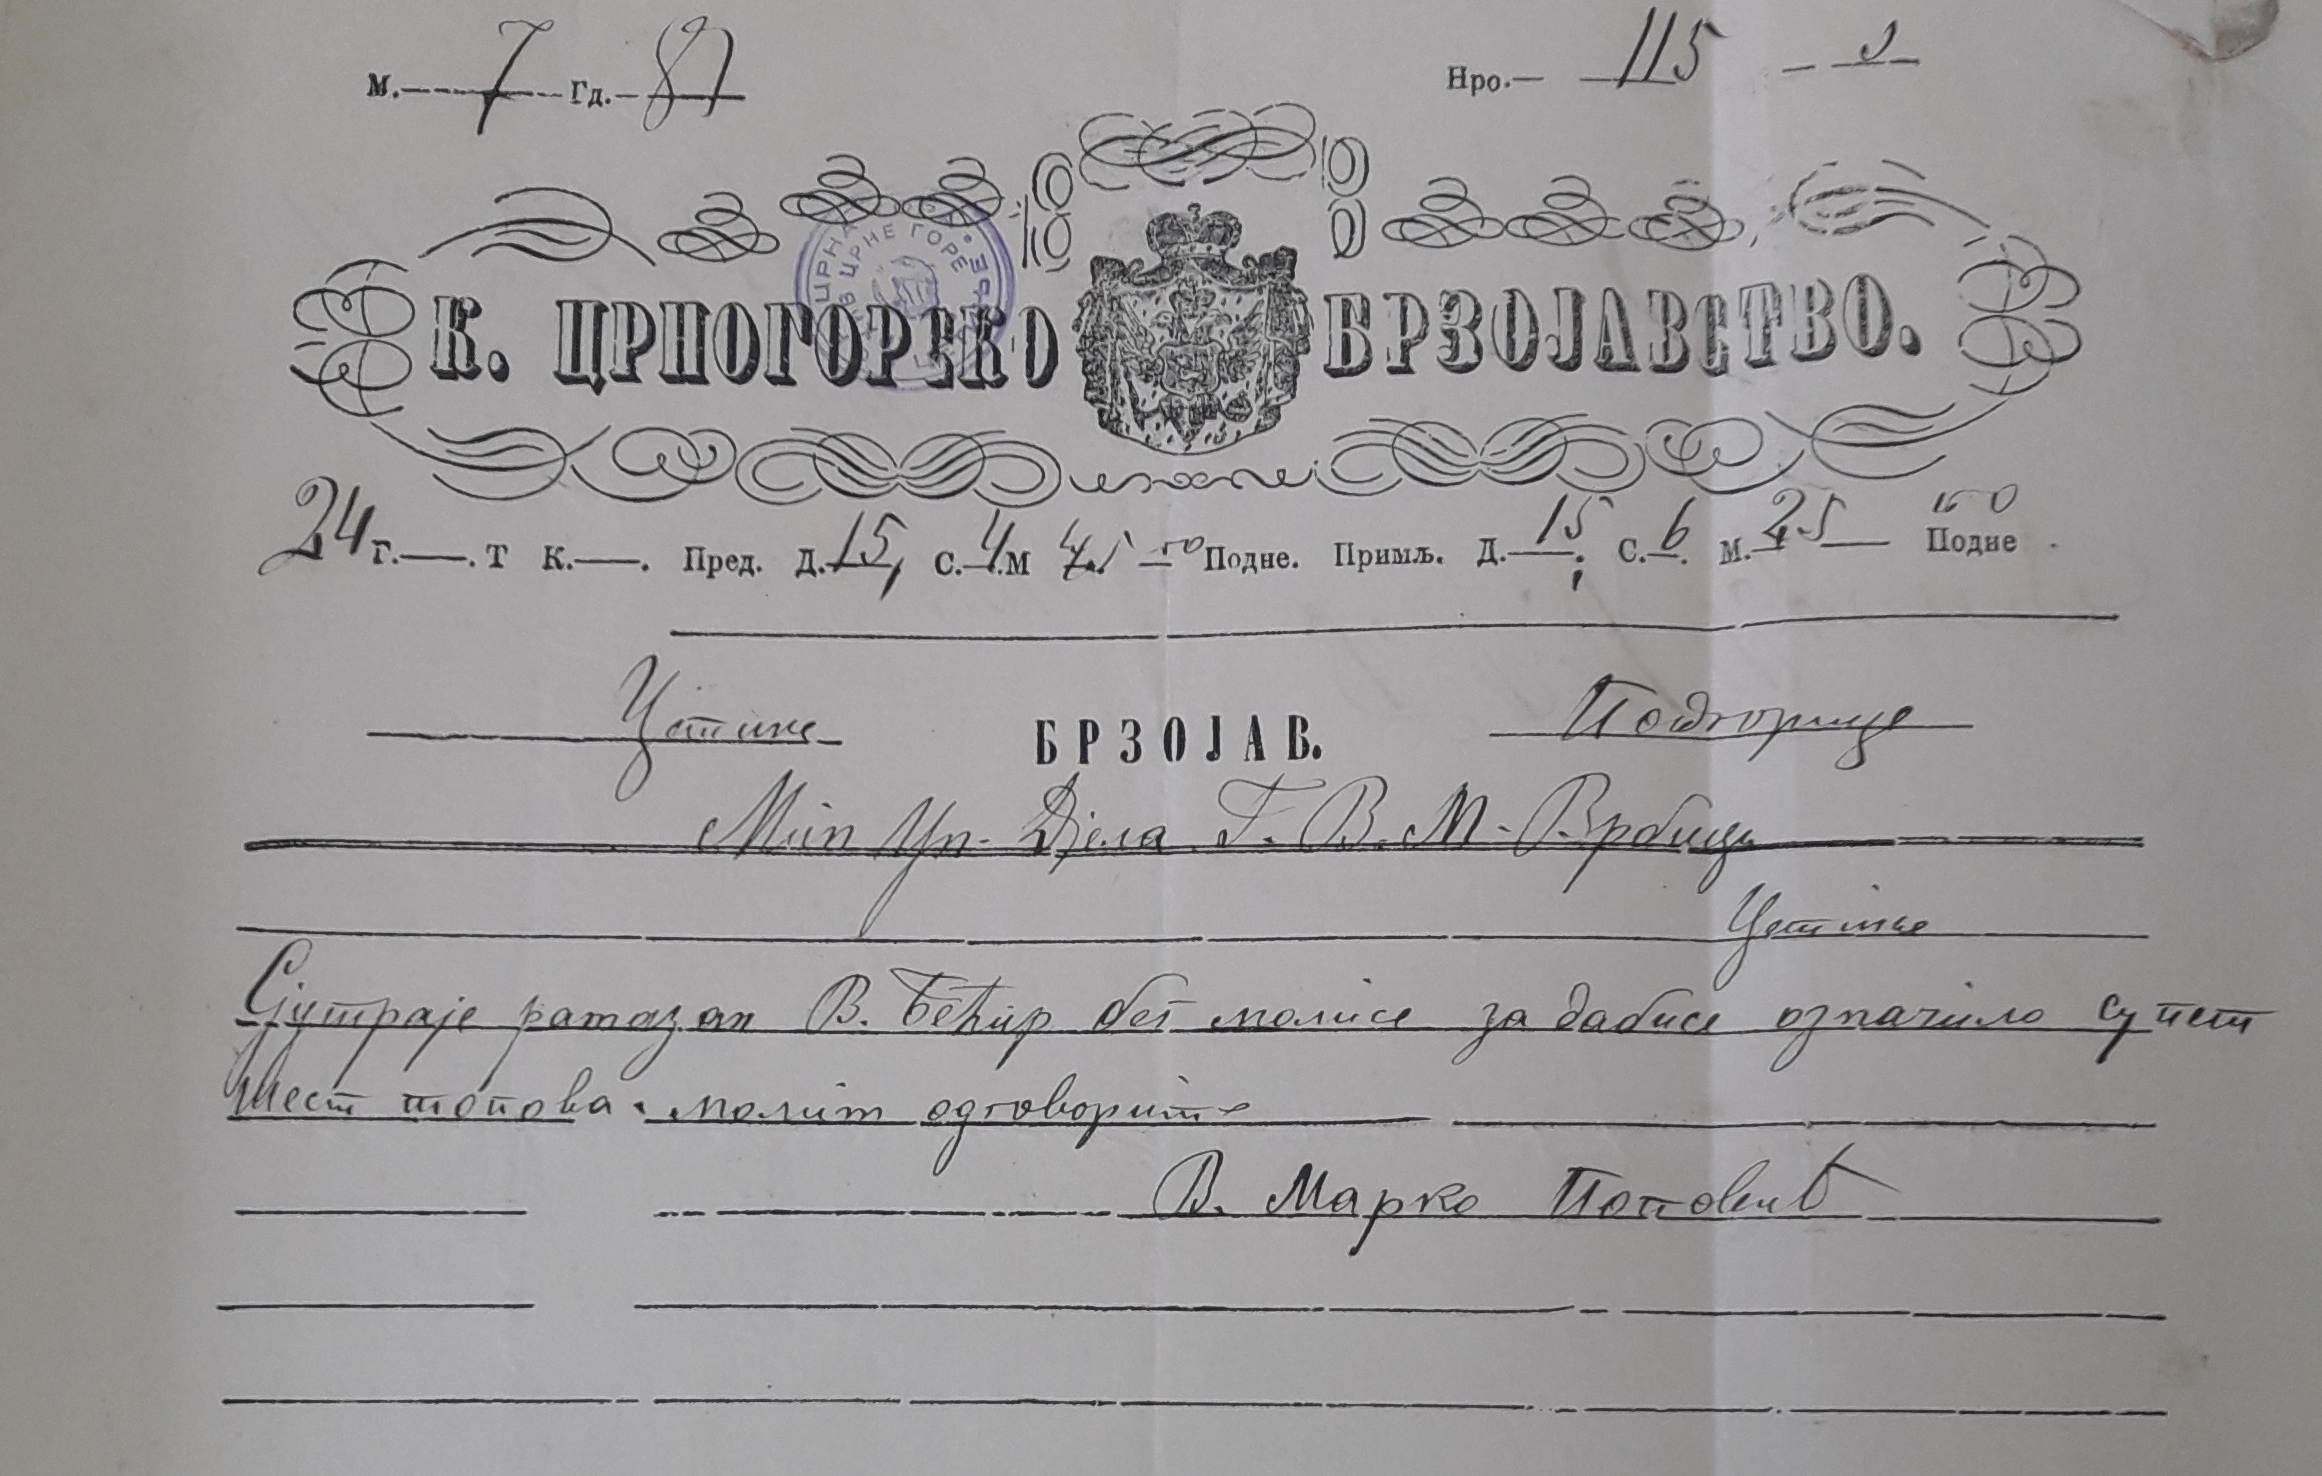 Molba vojvode Bećir bega Osmanagića da se proslava Ramazana obilježi topovskim plotunima, MUD, jun 1881.